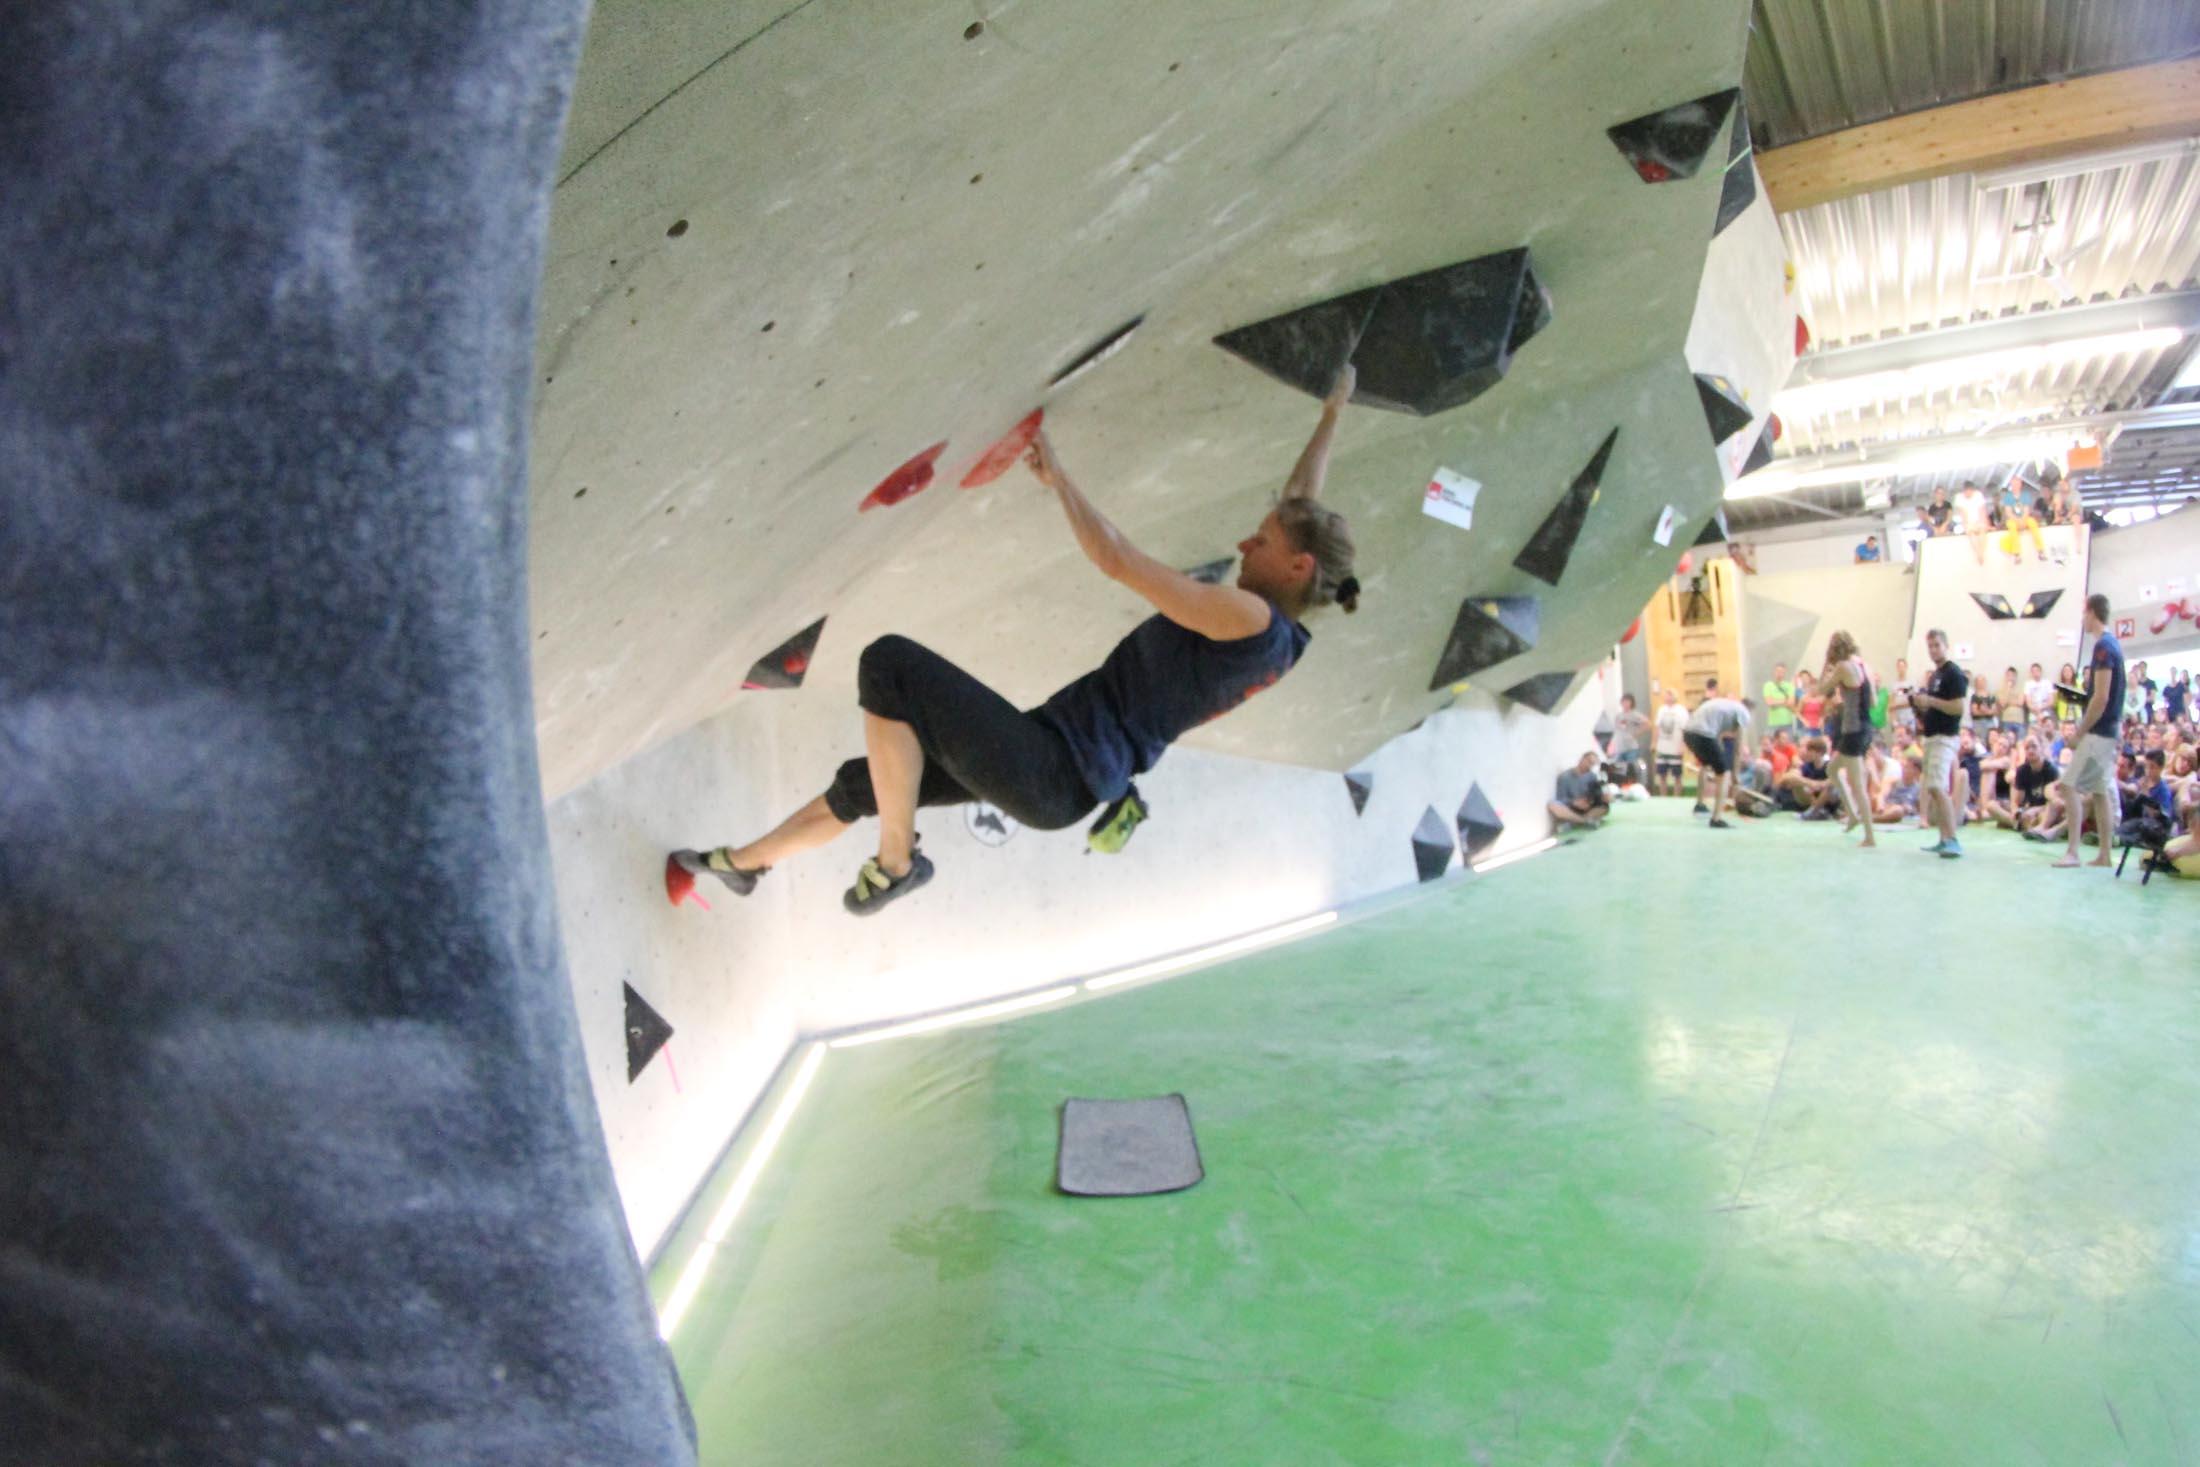 Finale, internationaler bouldercup Frankenjura 2016, BLOCKHELDEN Erlangen, Mammut, Bergfreunde.de, Boulderwettkampf07092016668